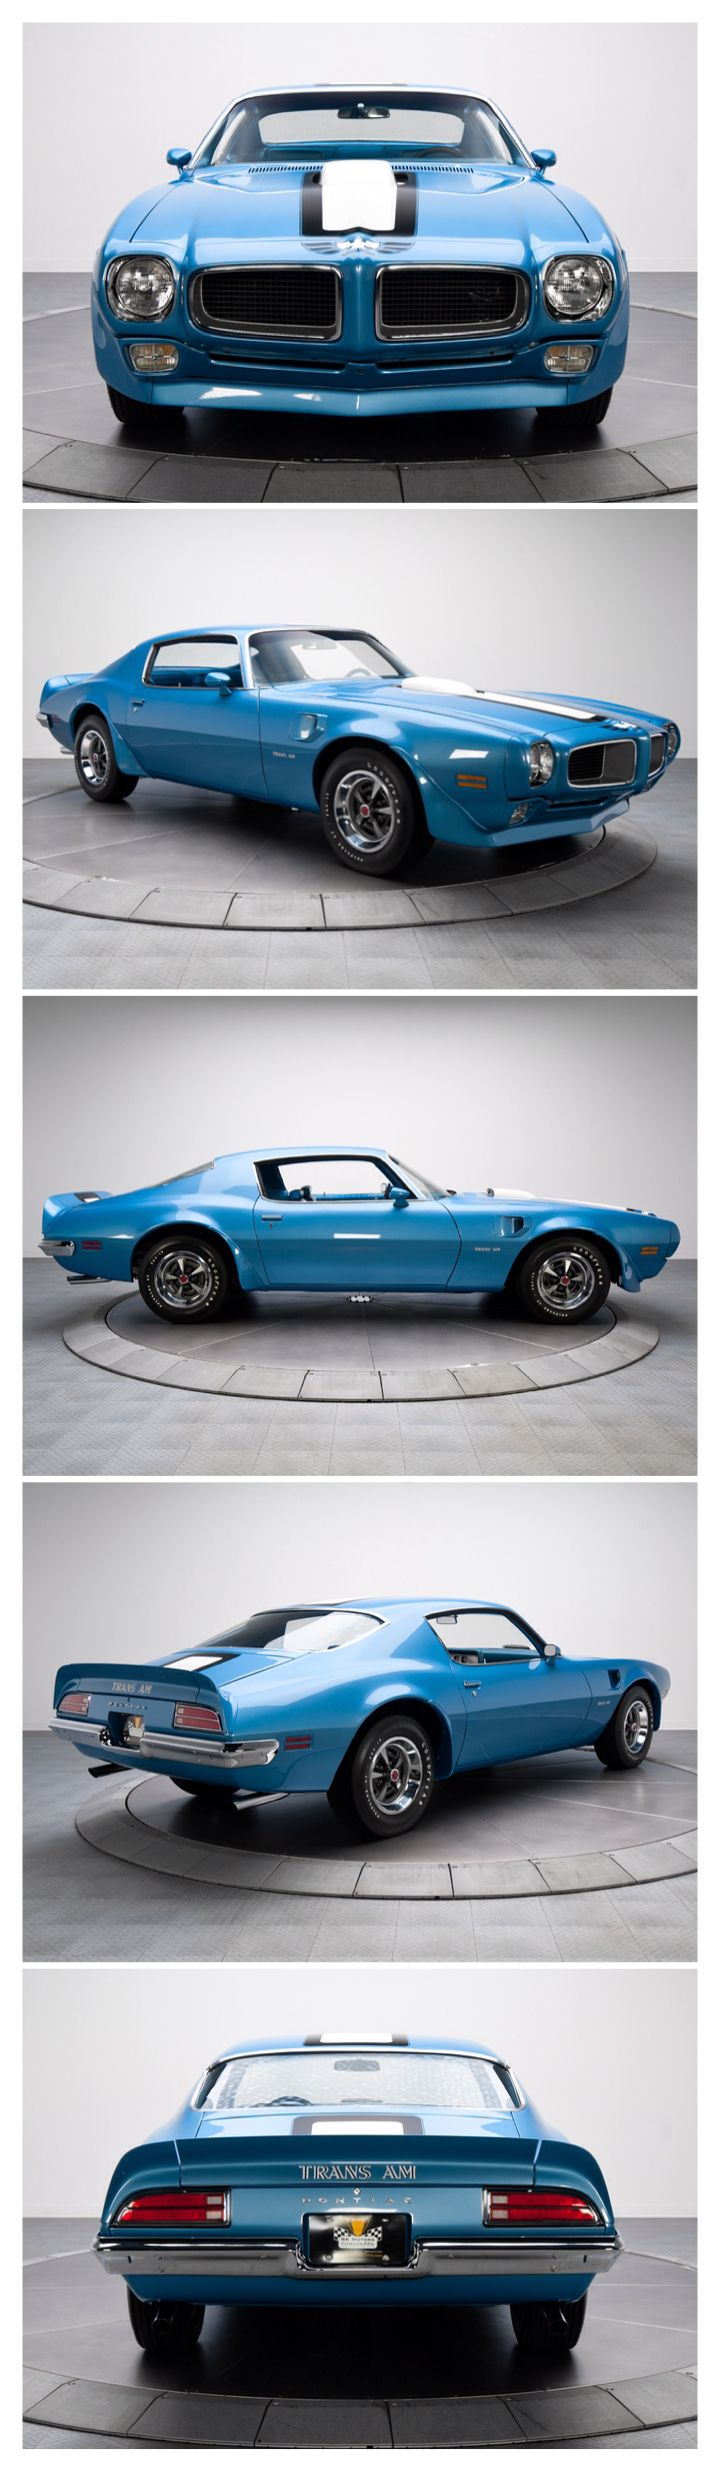 1970 Pontiac Trans Am Love the shape